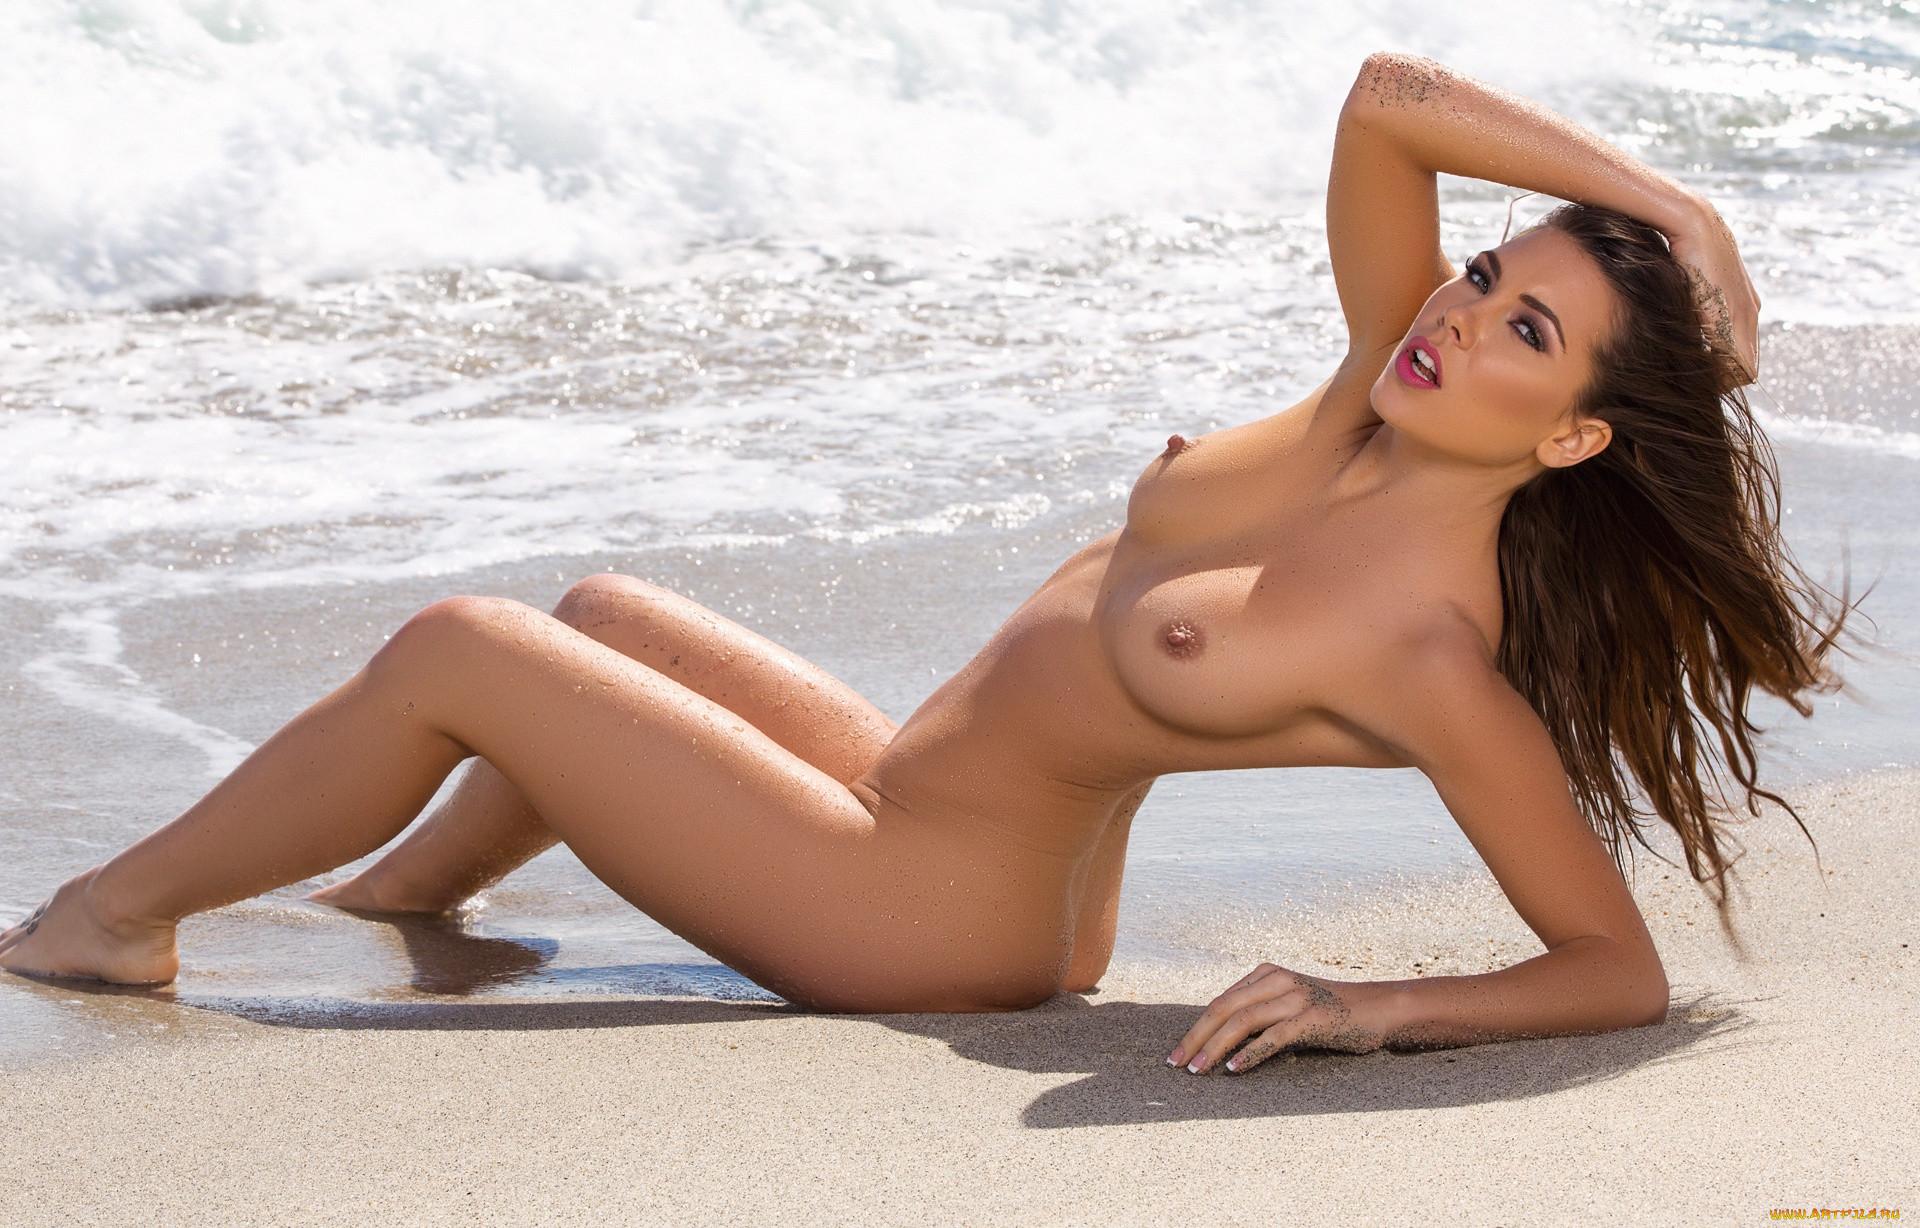 Cyber girls nude beach — img 13